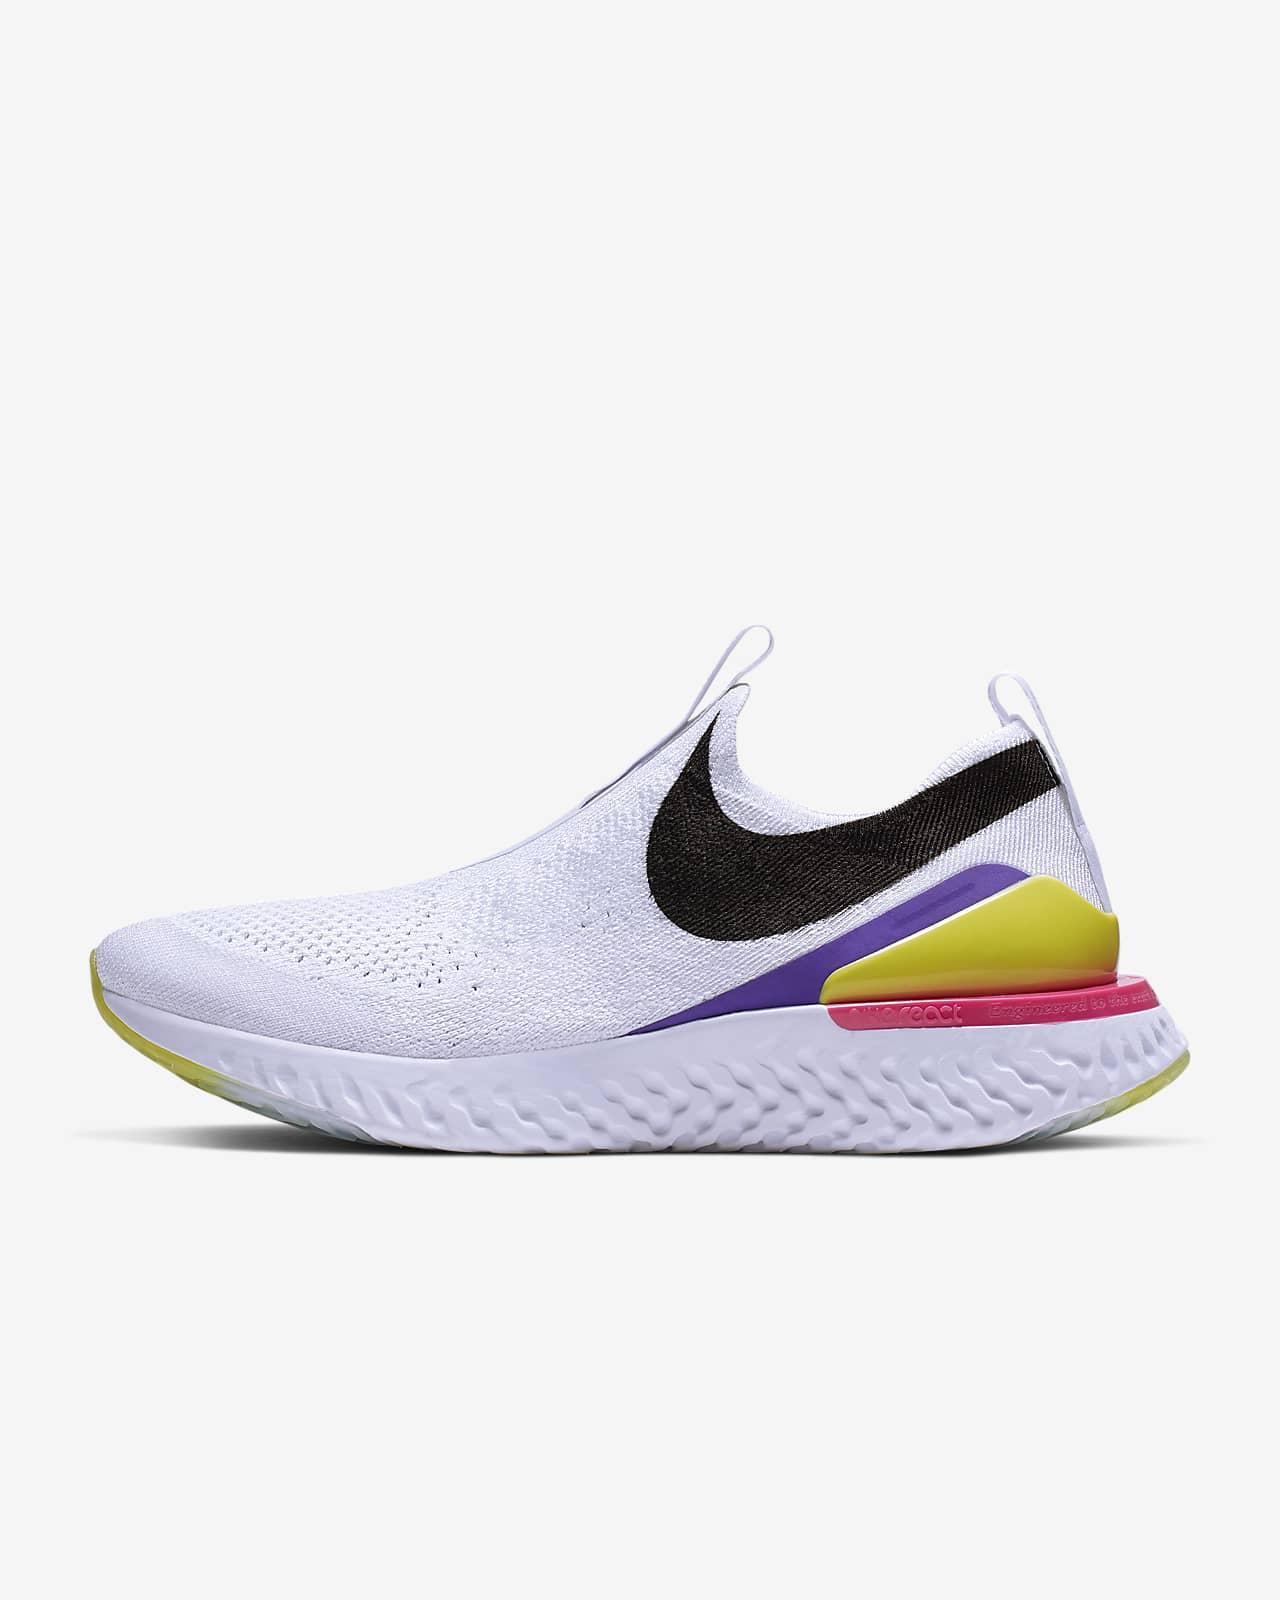 NikeEpic PHNTM React FK JDI女子跑步鞋